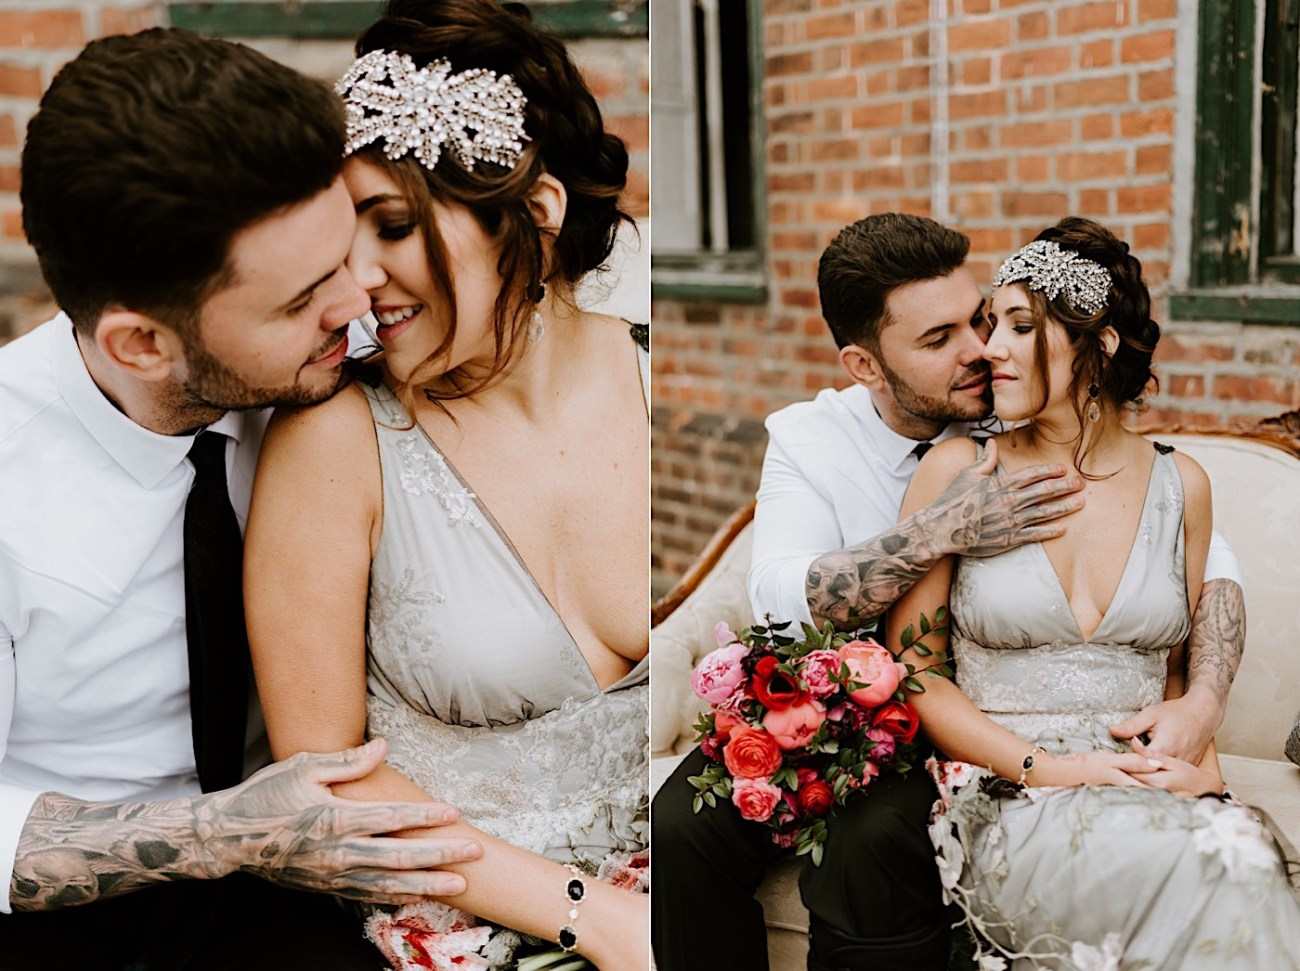 Romantic Phildalephia Wedding Photographer Philadelphia Wedding Venue Barnsley Manor Wedding 57